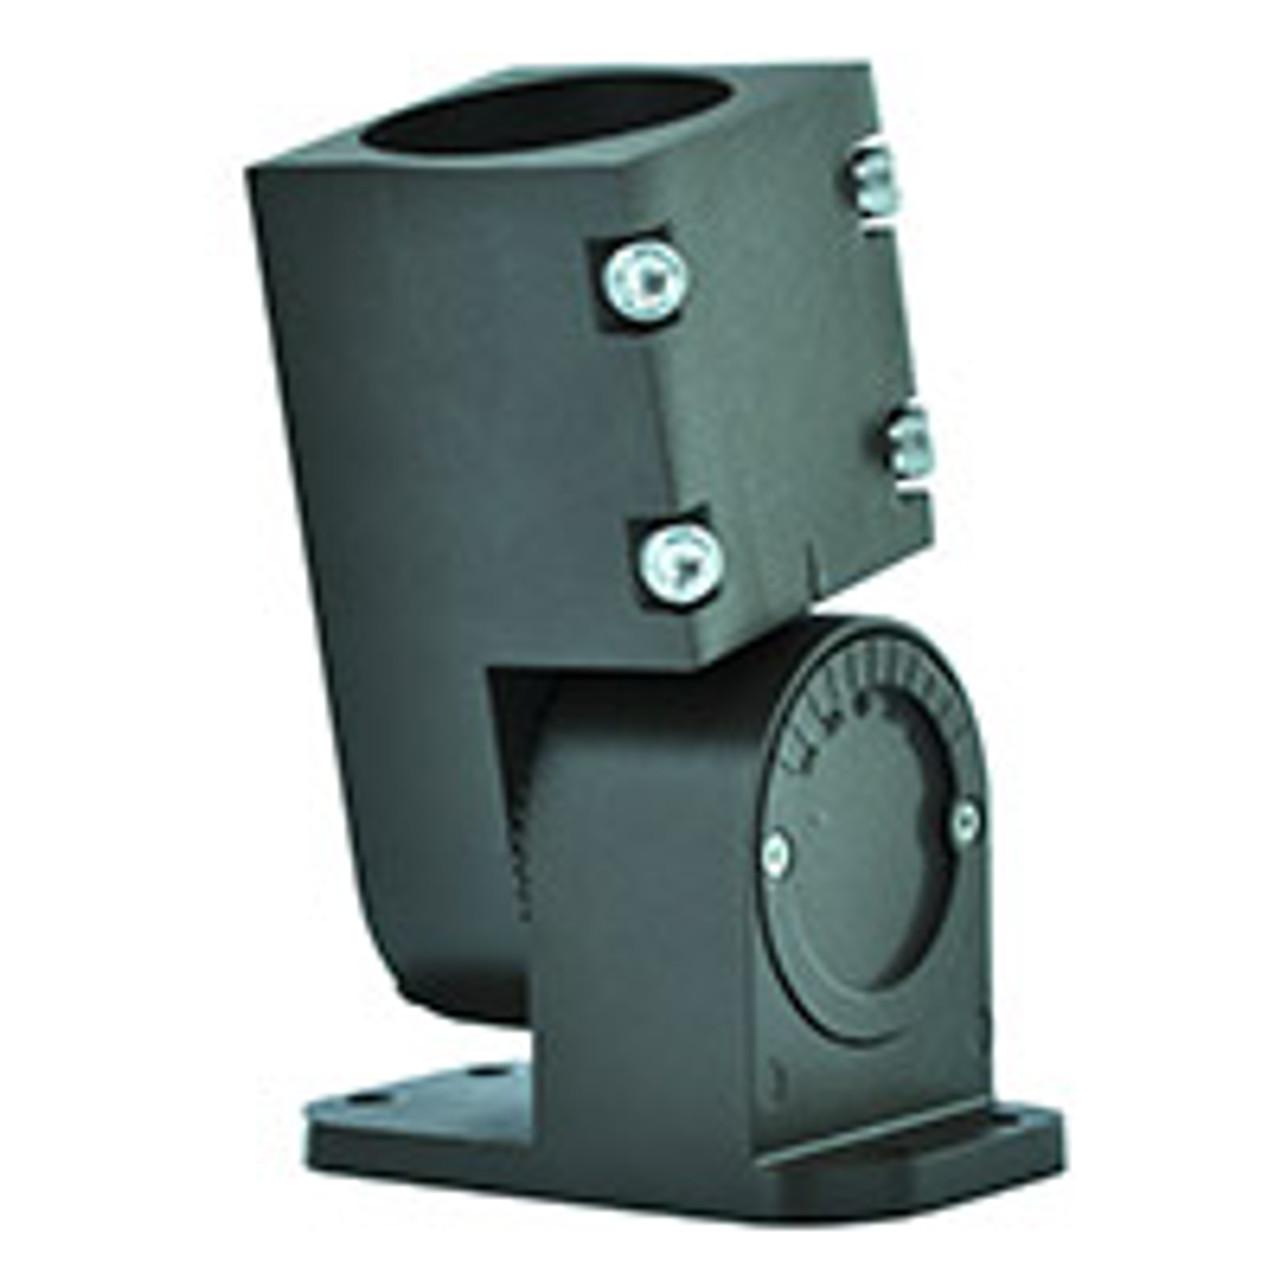 Mount - Small Slip Fitter - 60-150W Shoebox